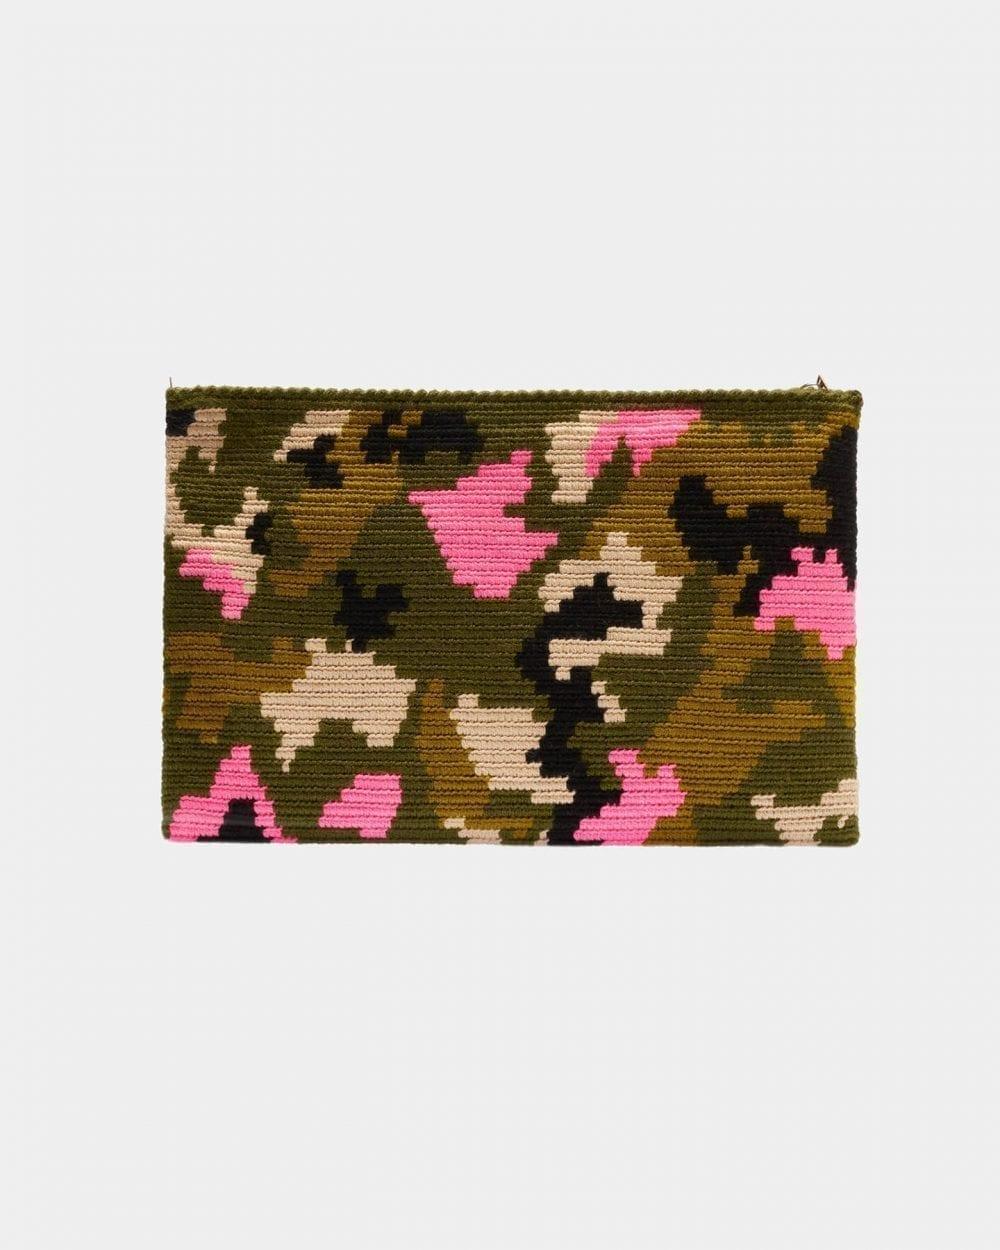 Harmony Camouflage clutch by ALLBYB Design, Philadelphia